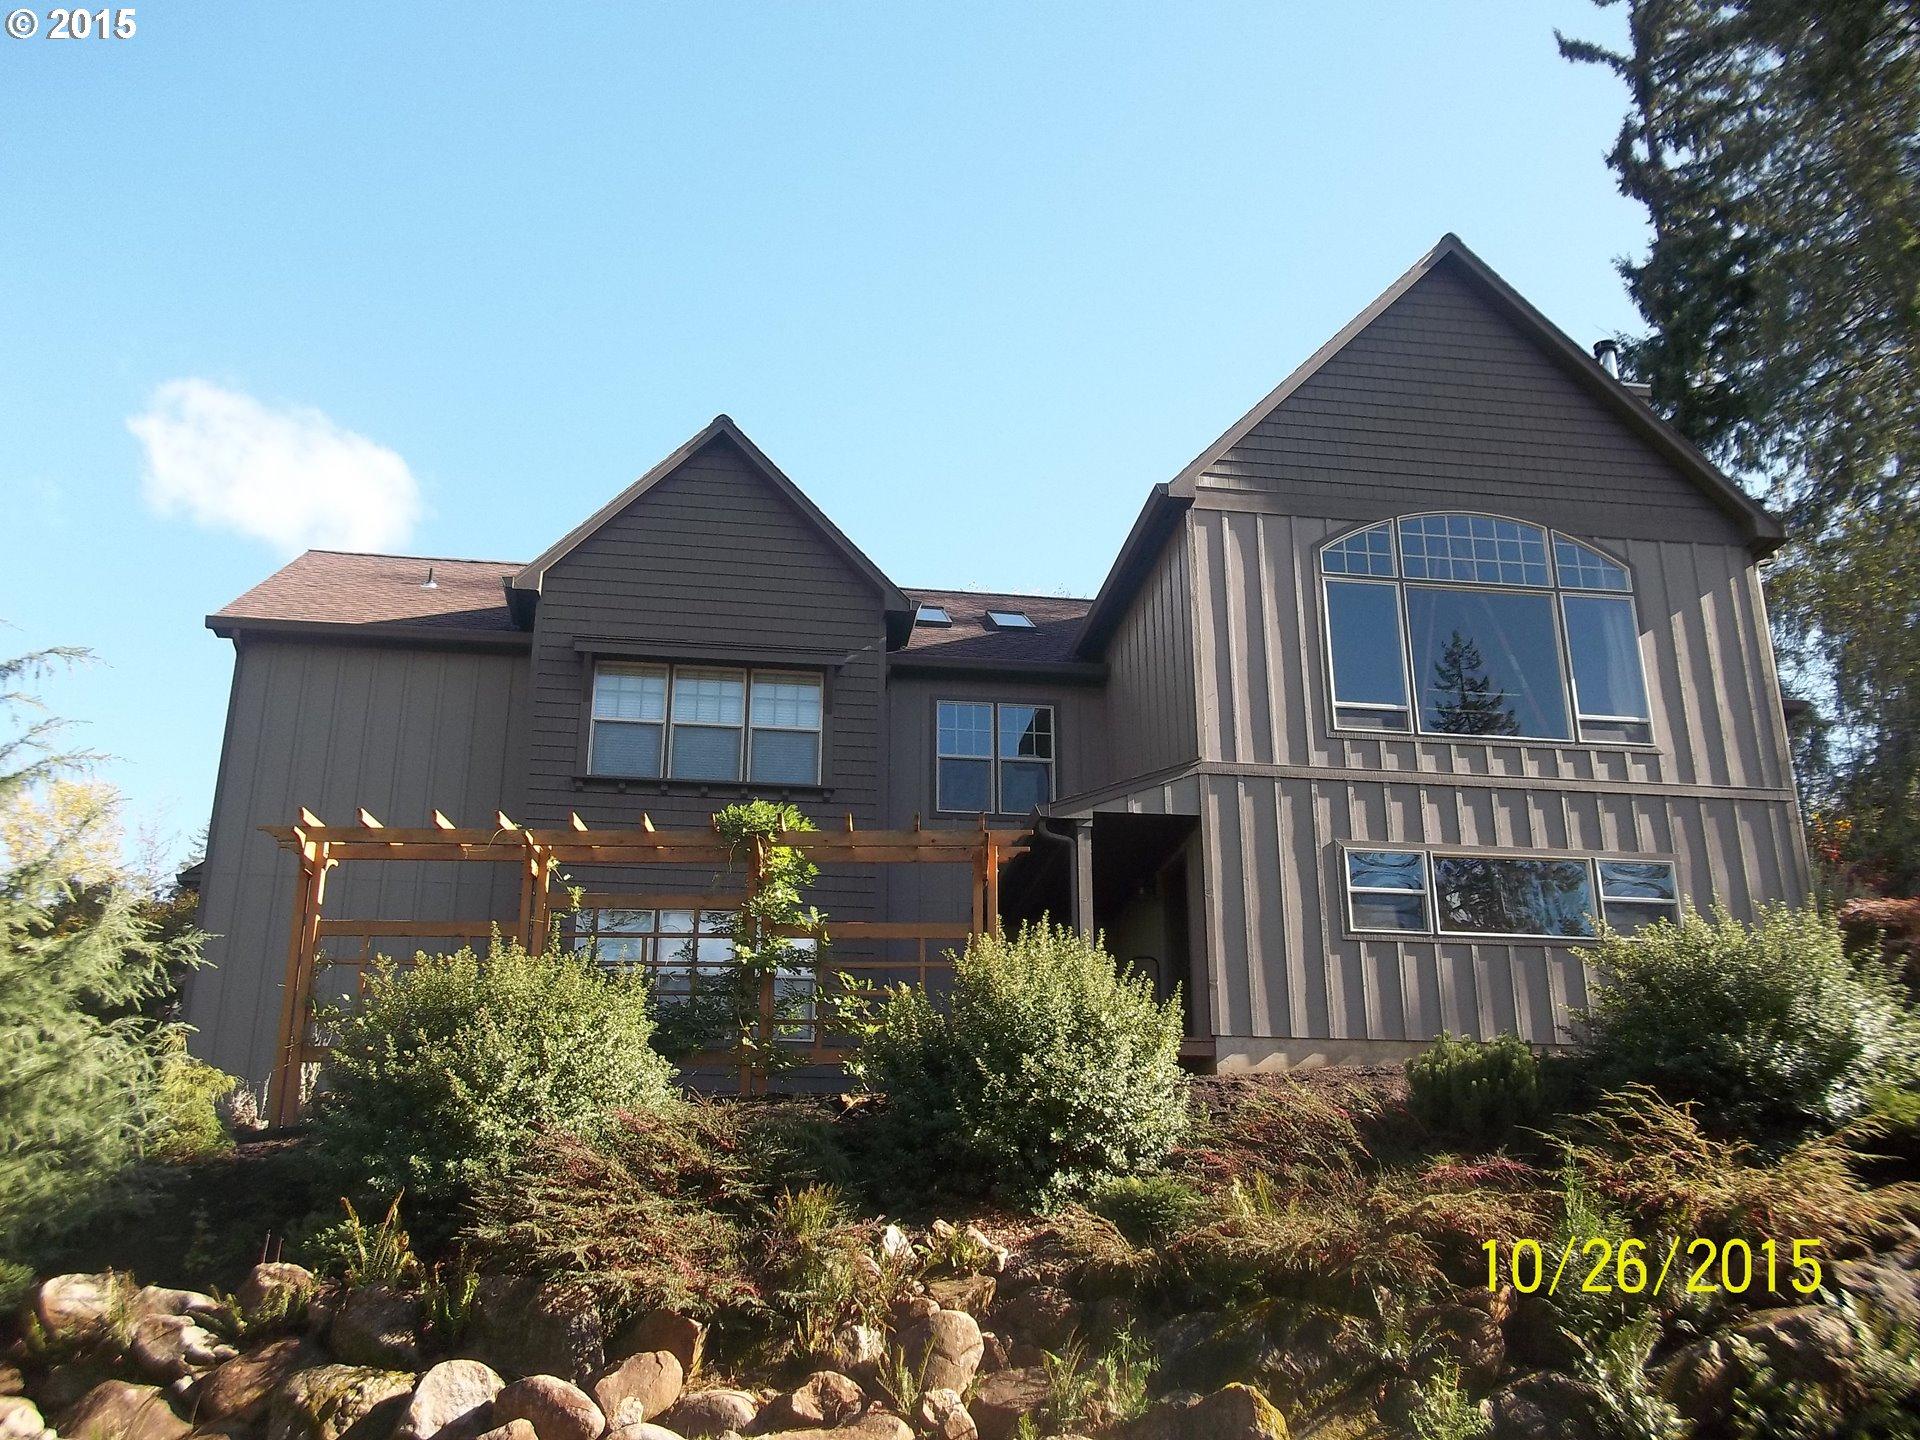 78137 Rat Creek Road, Cottage Grove, Oregon 97424